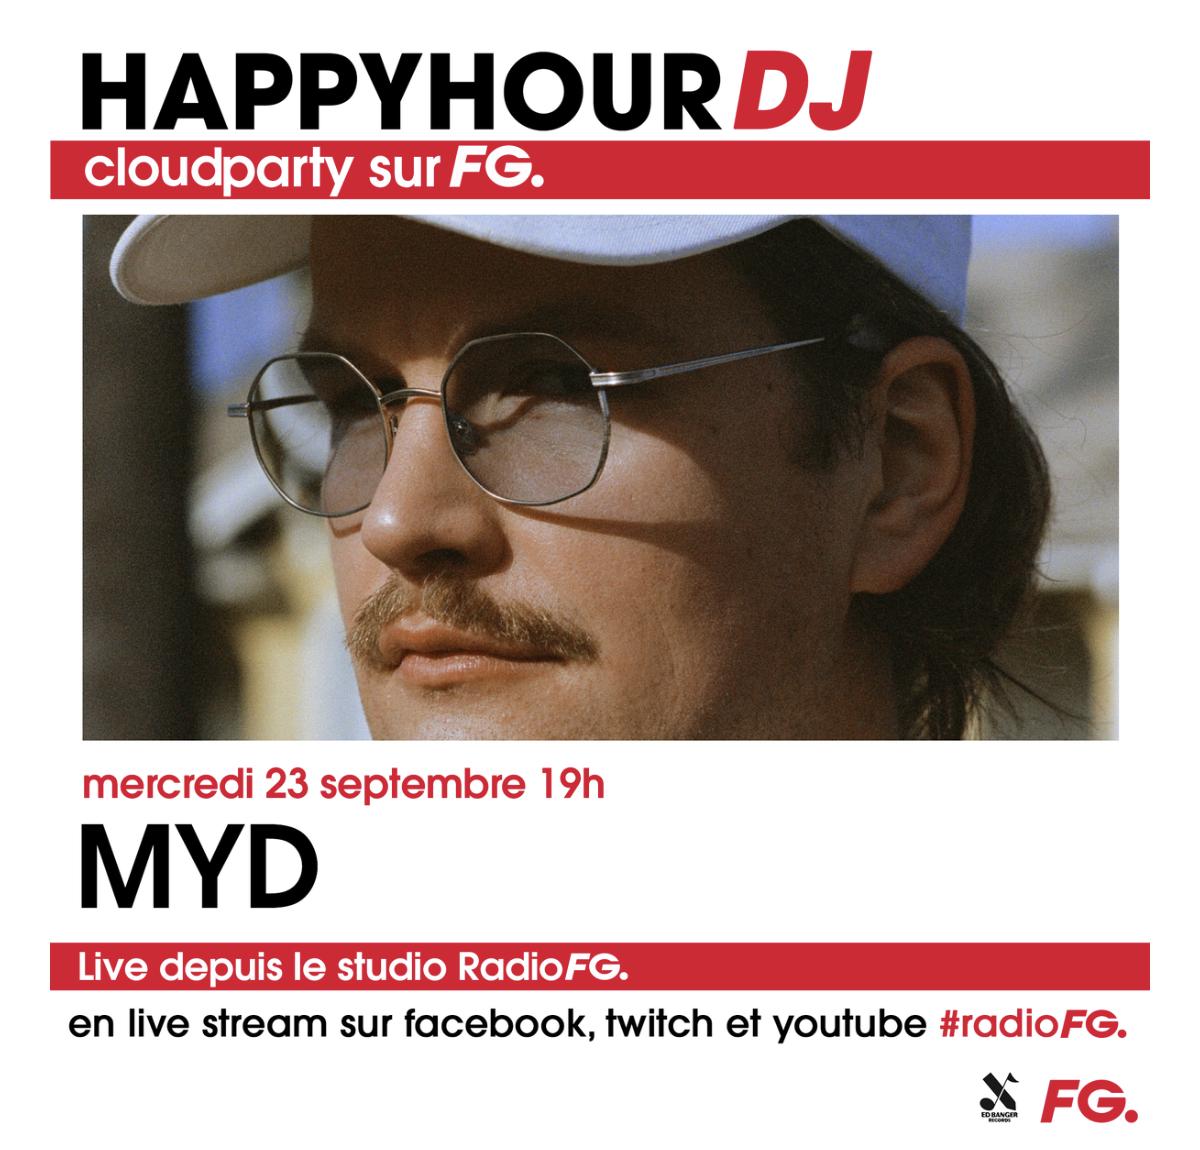 Radio FG : 42 heures de mixes hebdomadaires